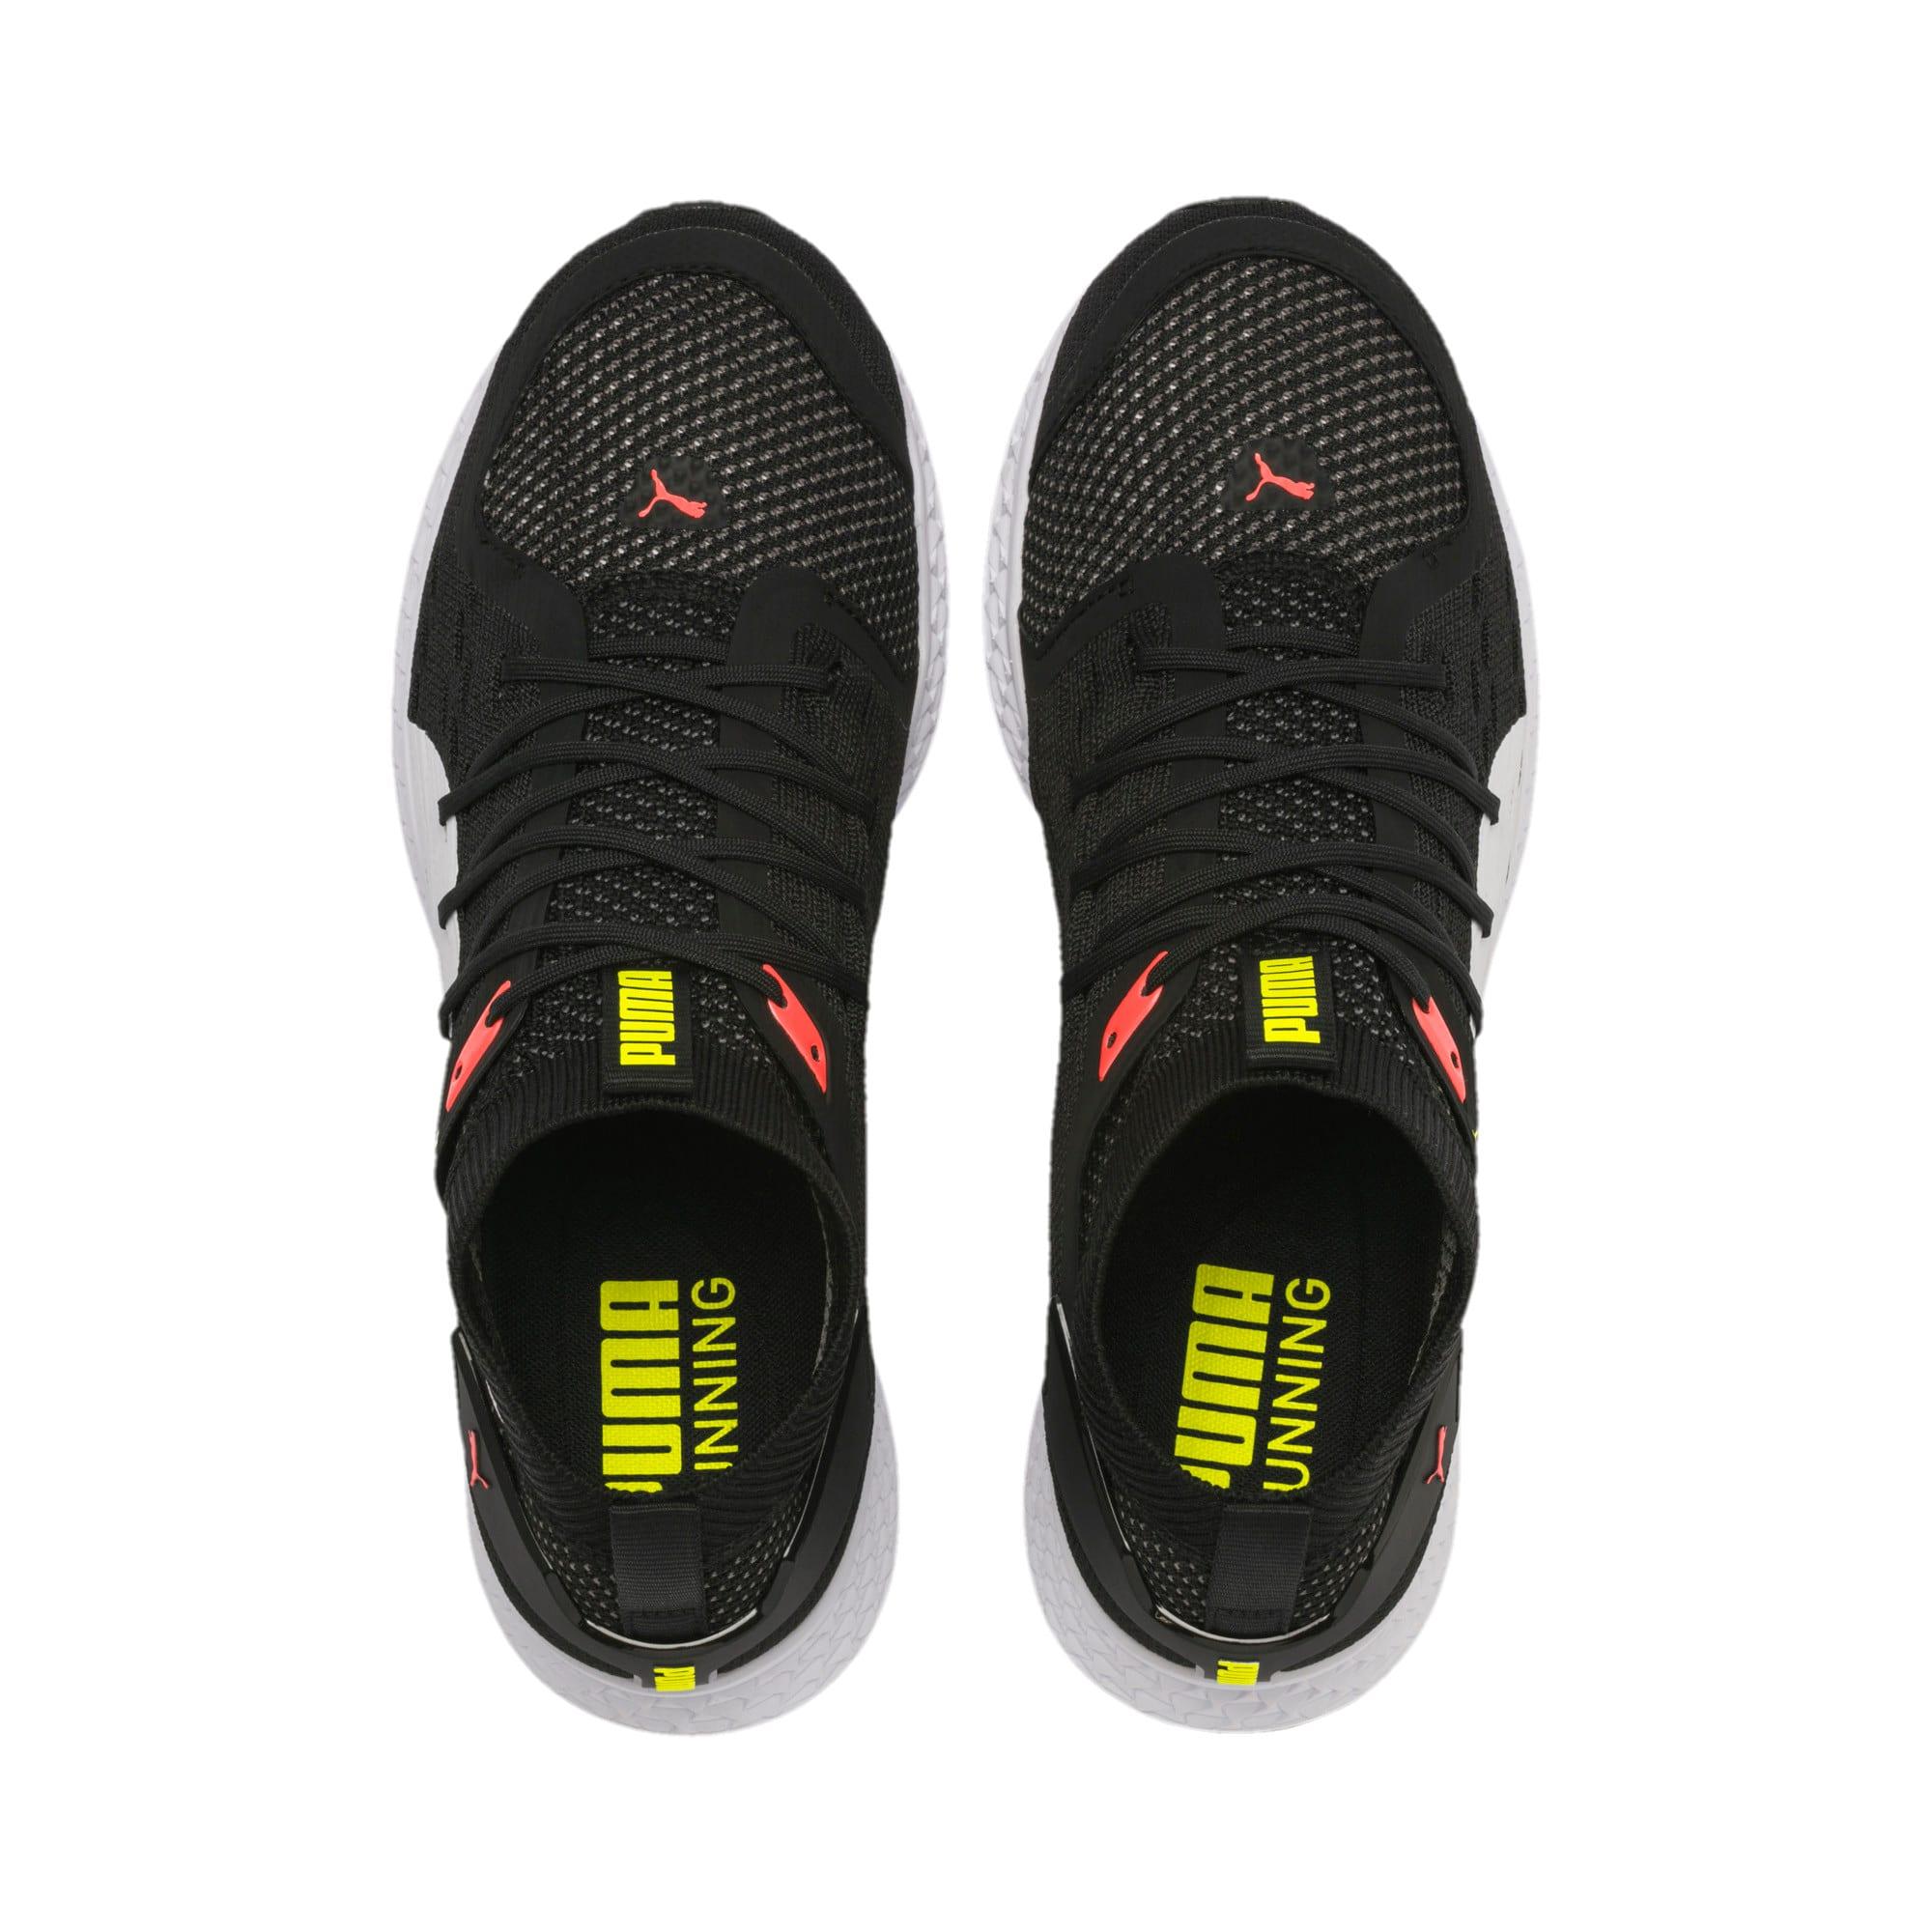 Thumbnail 7 of SPEED 500 Men's Running Shoes, Black-White-Red-Yellow, medium